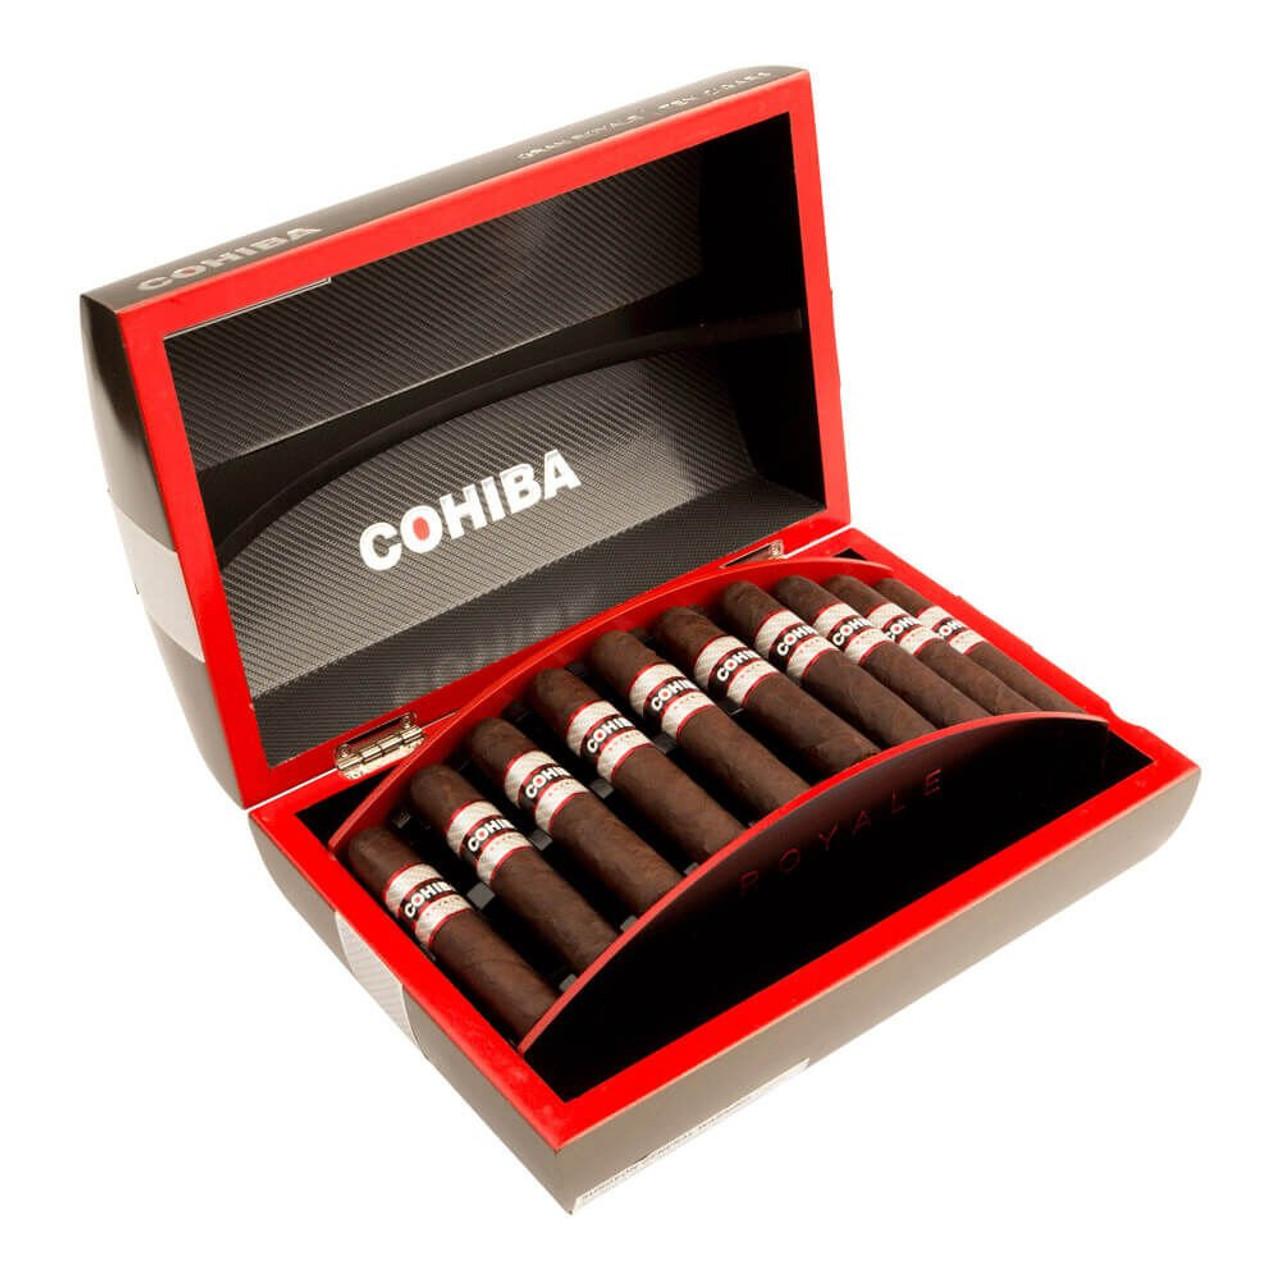 Cohiba Royale Toro Royale Cigars - 6 x 50 (Box of 10)